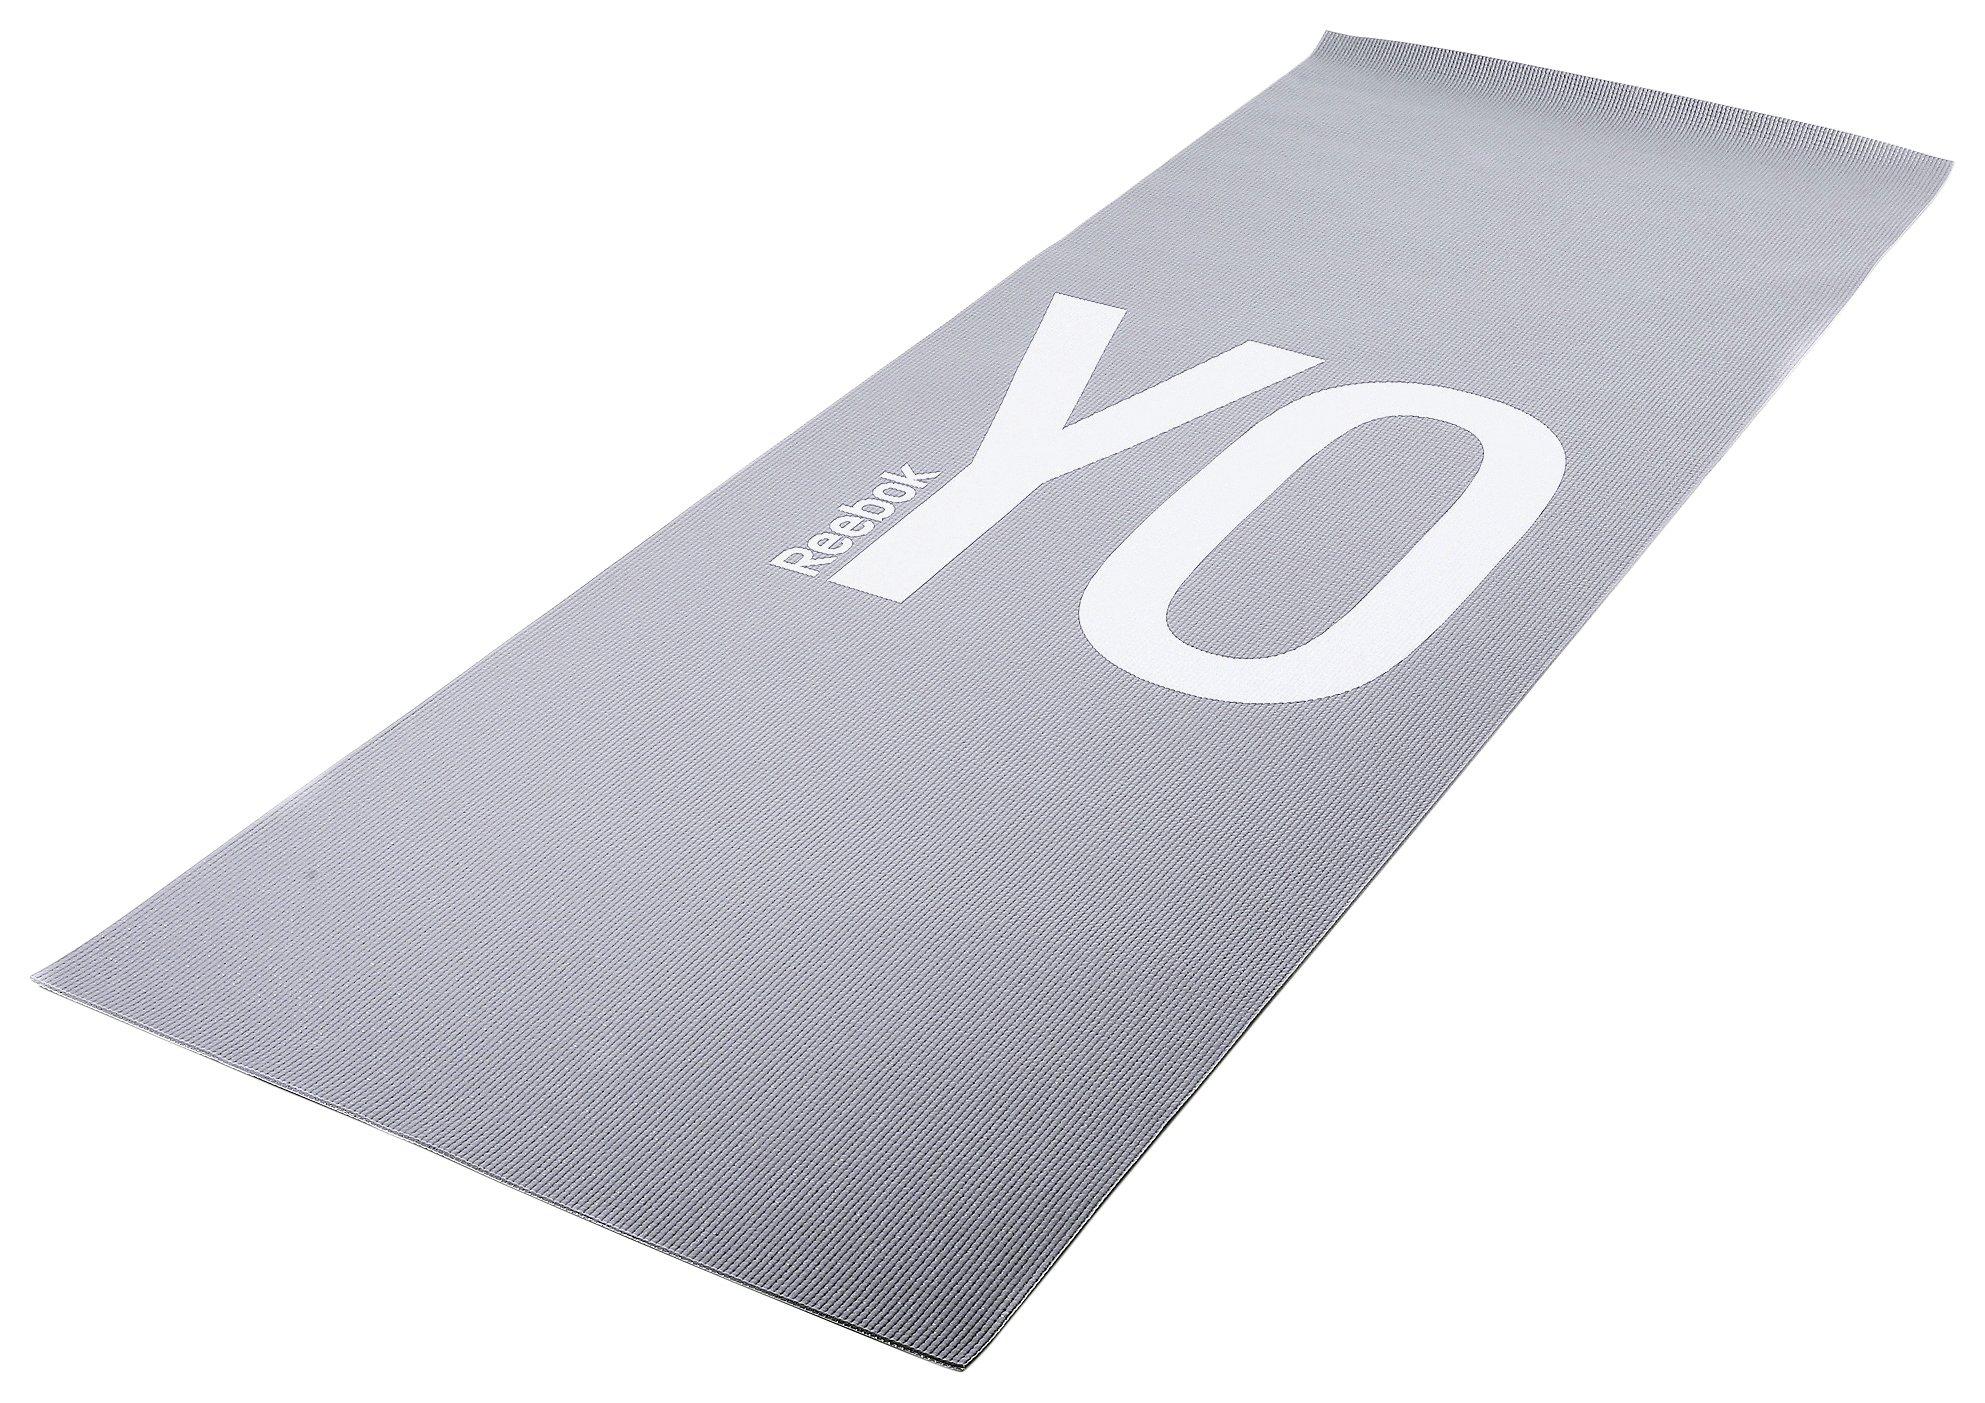 reebok yoga mat. reebok 4mm yoga exercise mat 4